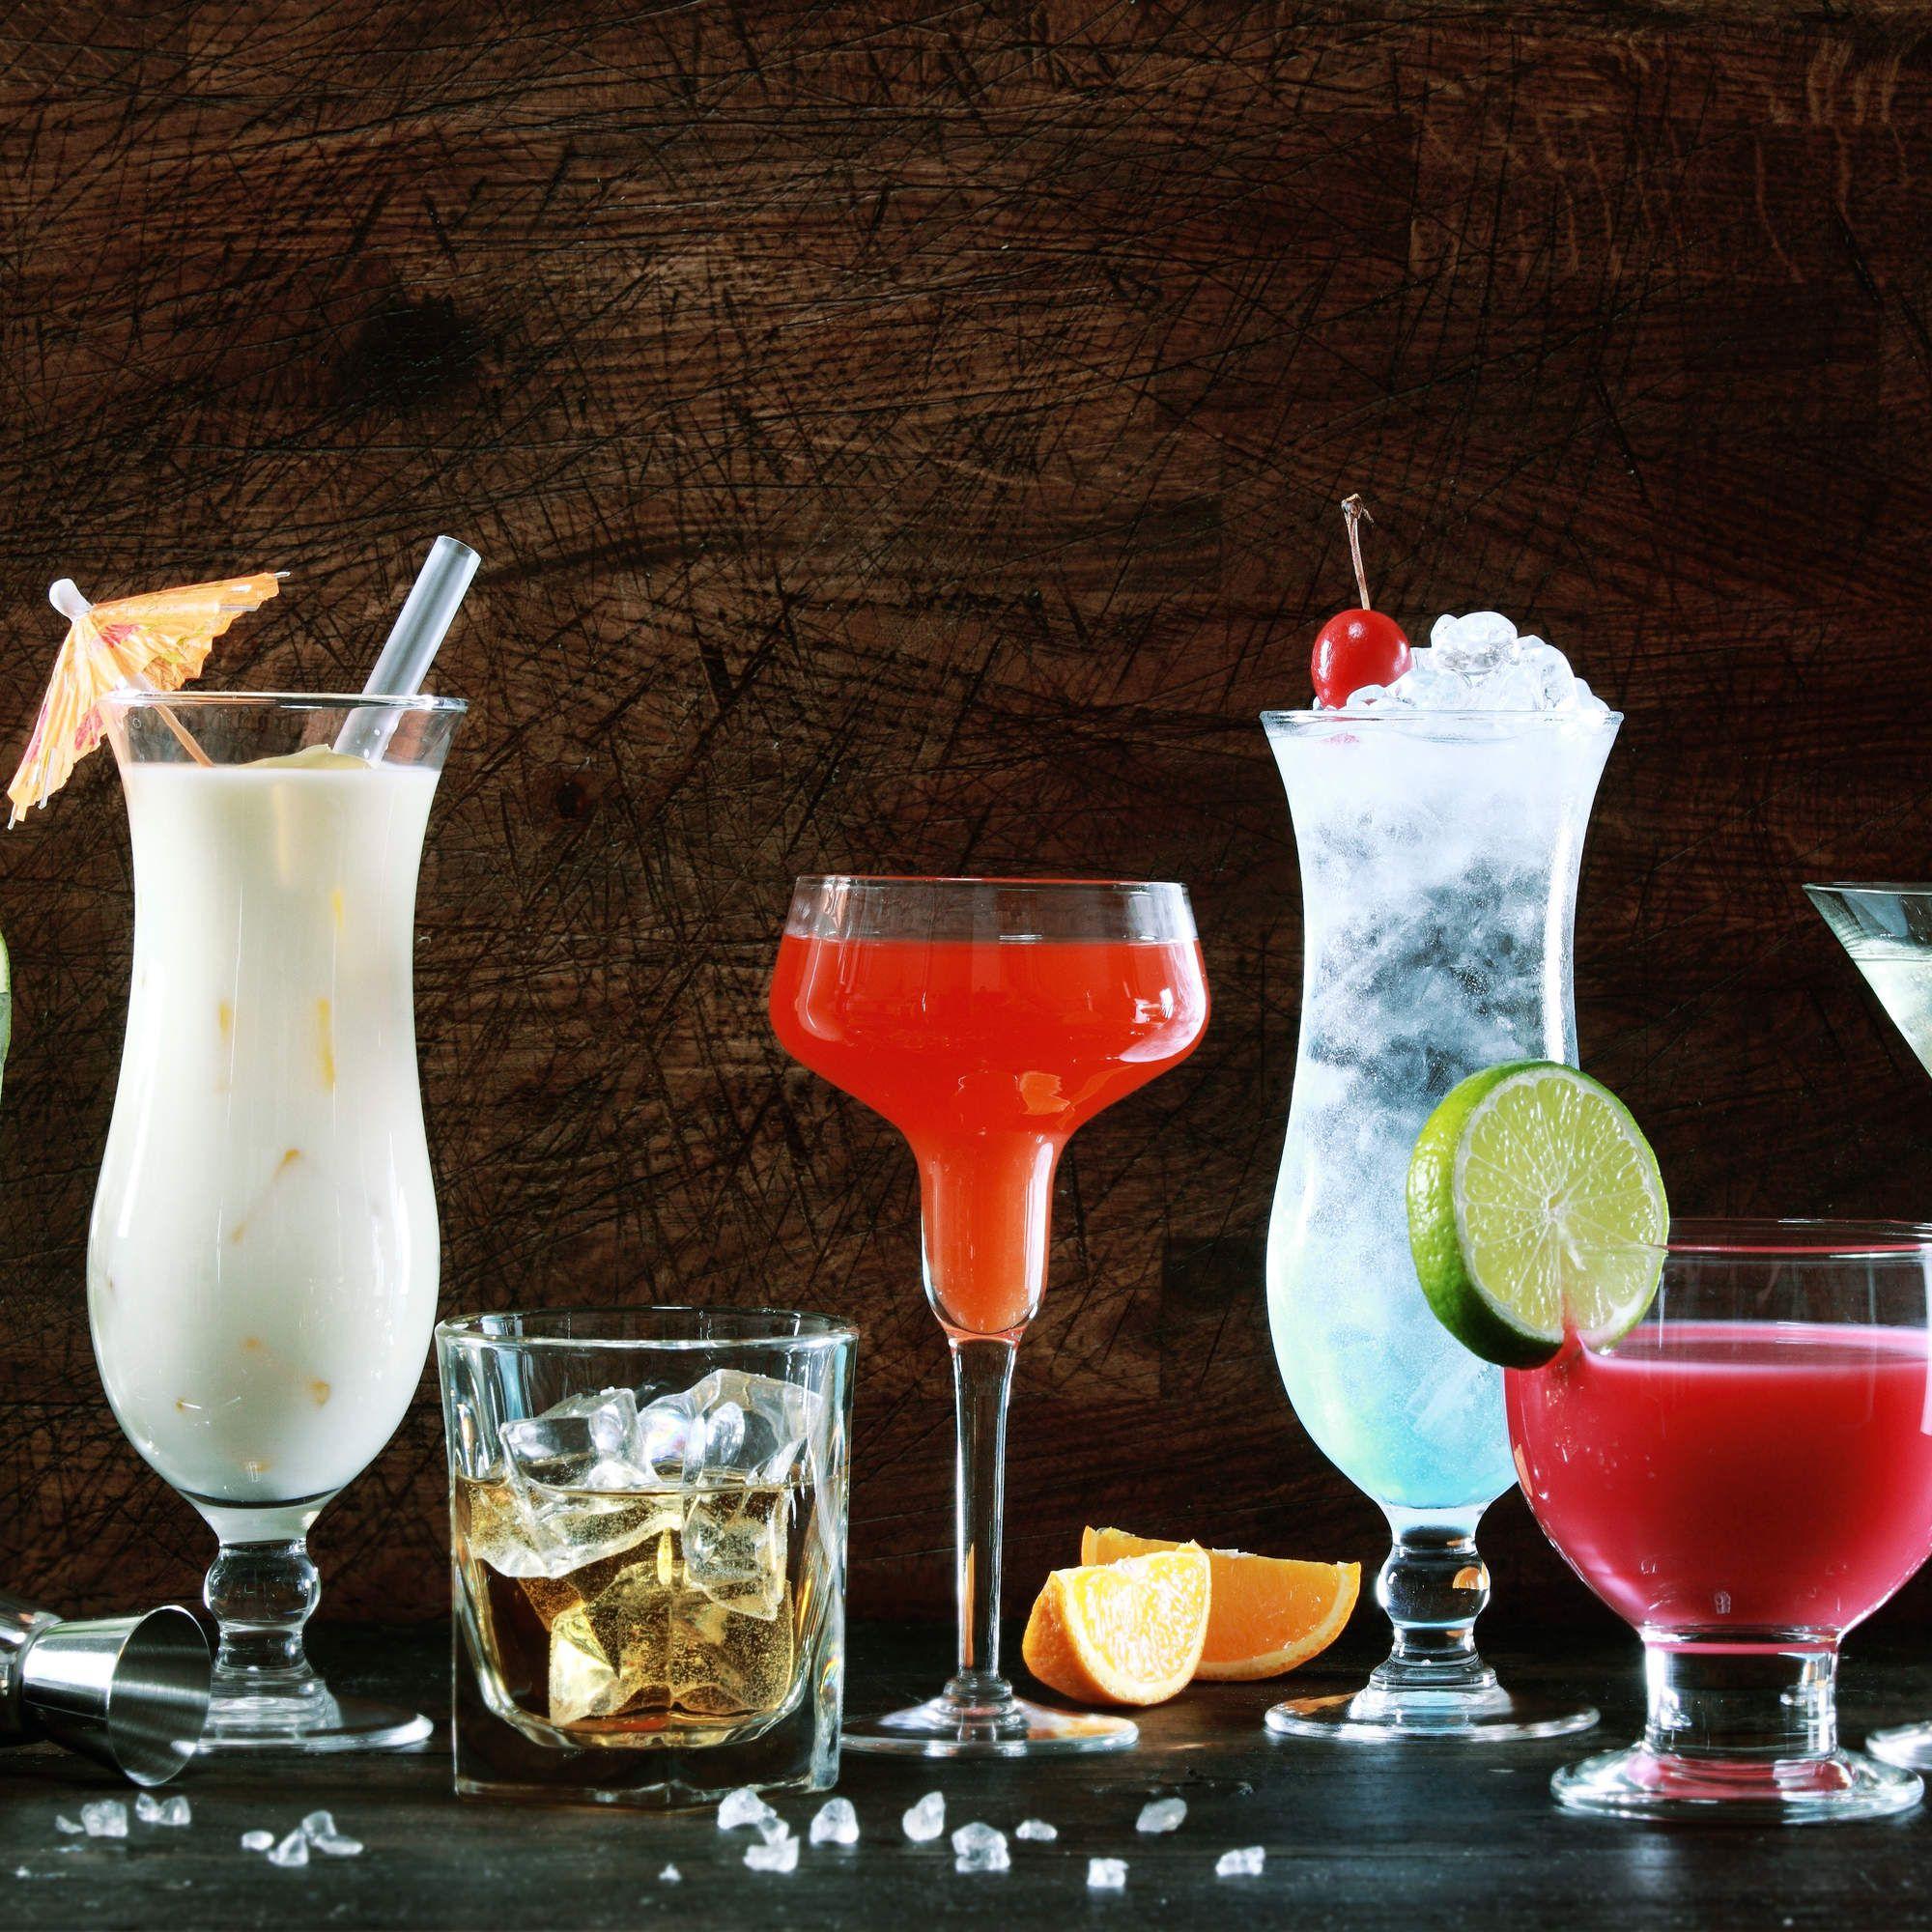 The 10 Most Popular Cocktails Ranked Popular Cocktails Most